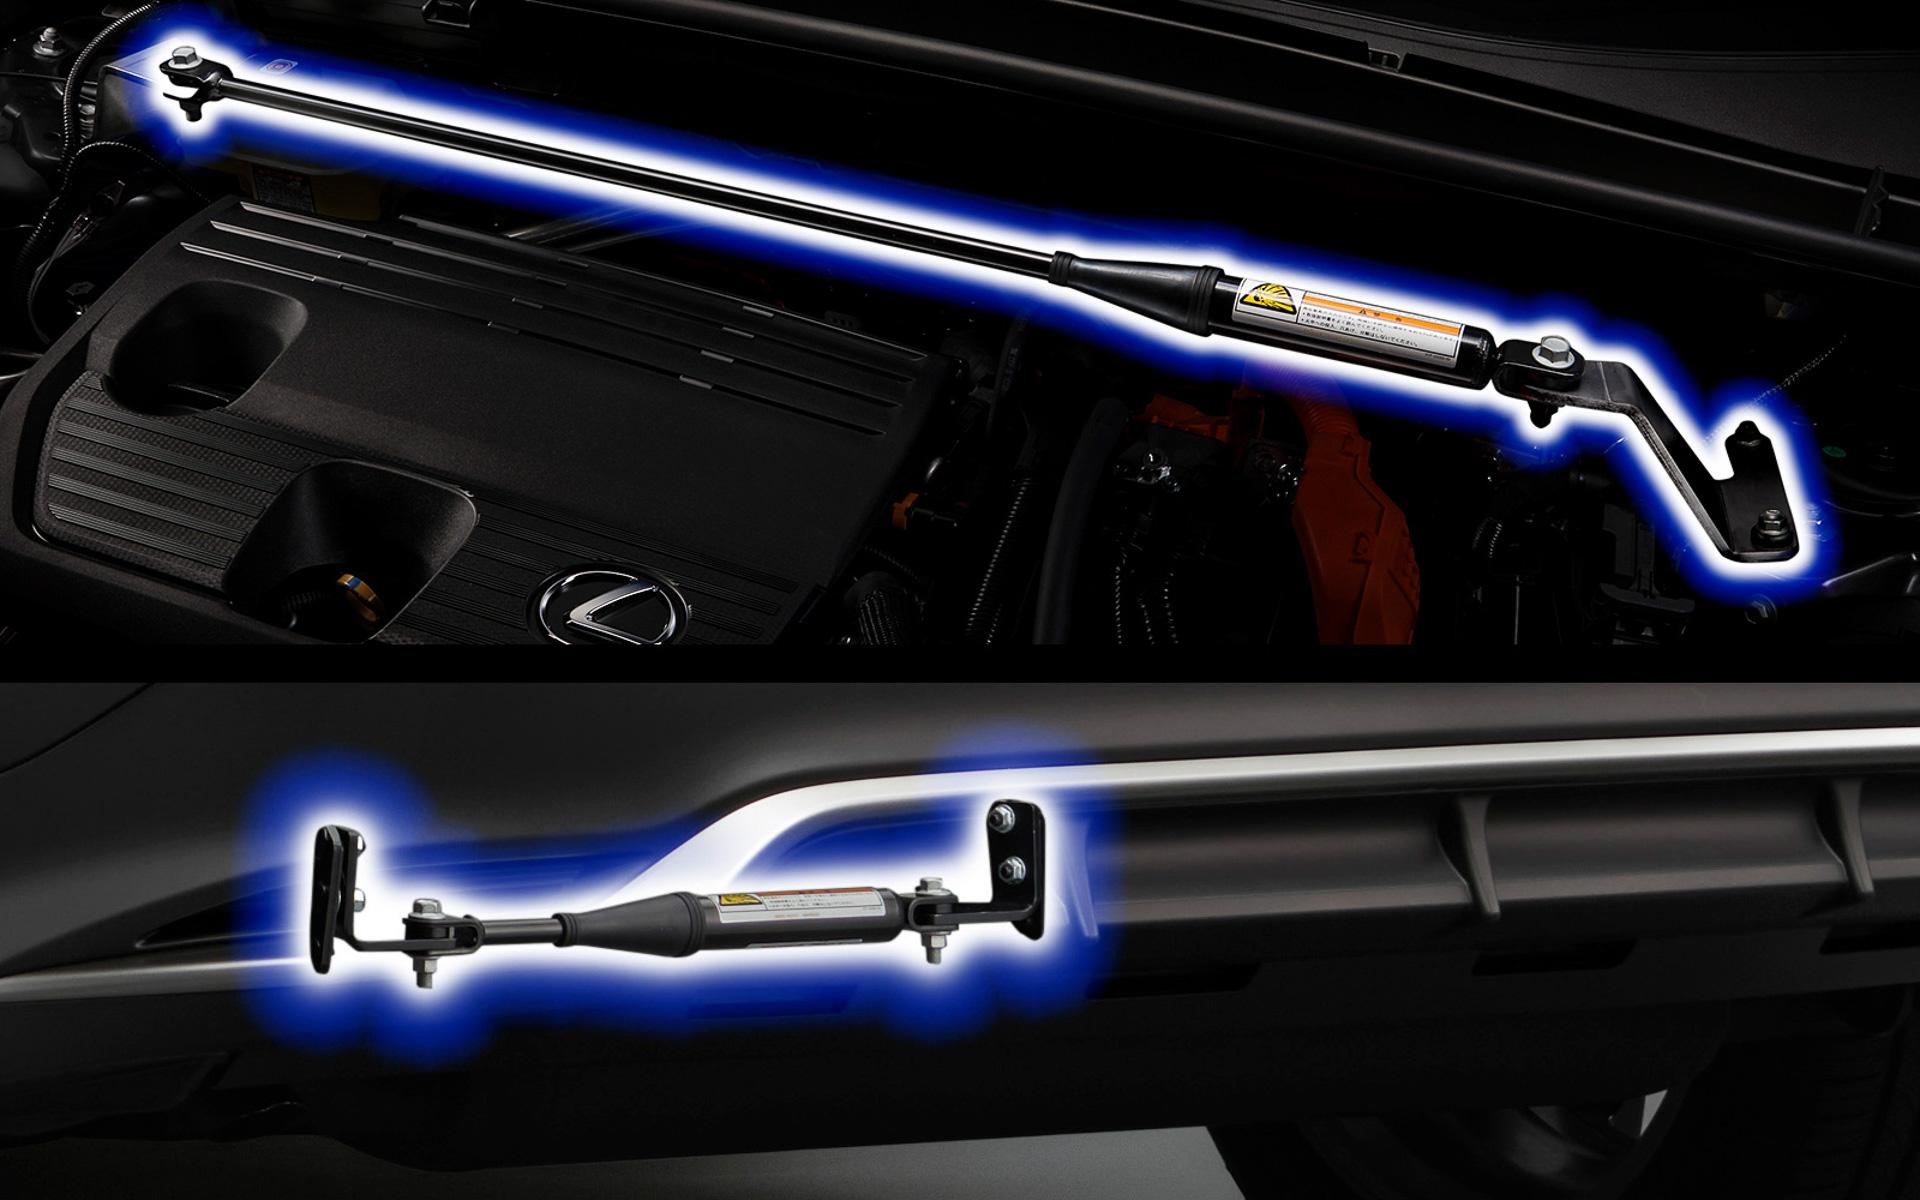 Lexus-NX-TRD-parts-9